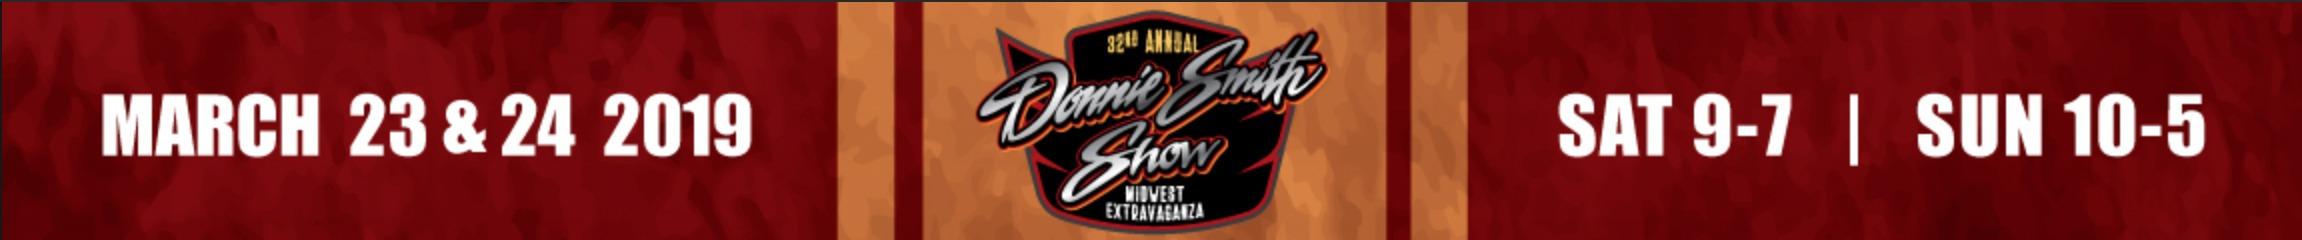 donnie-smith-bike-and-car-show